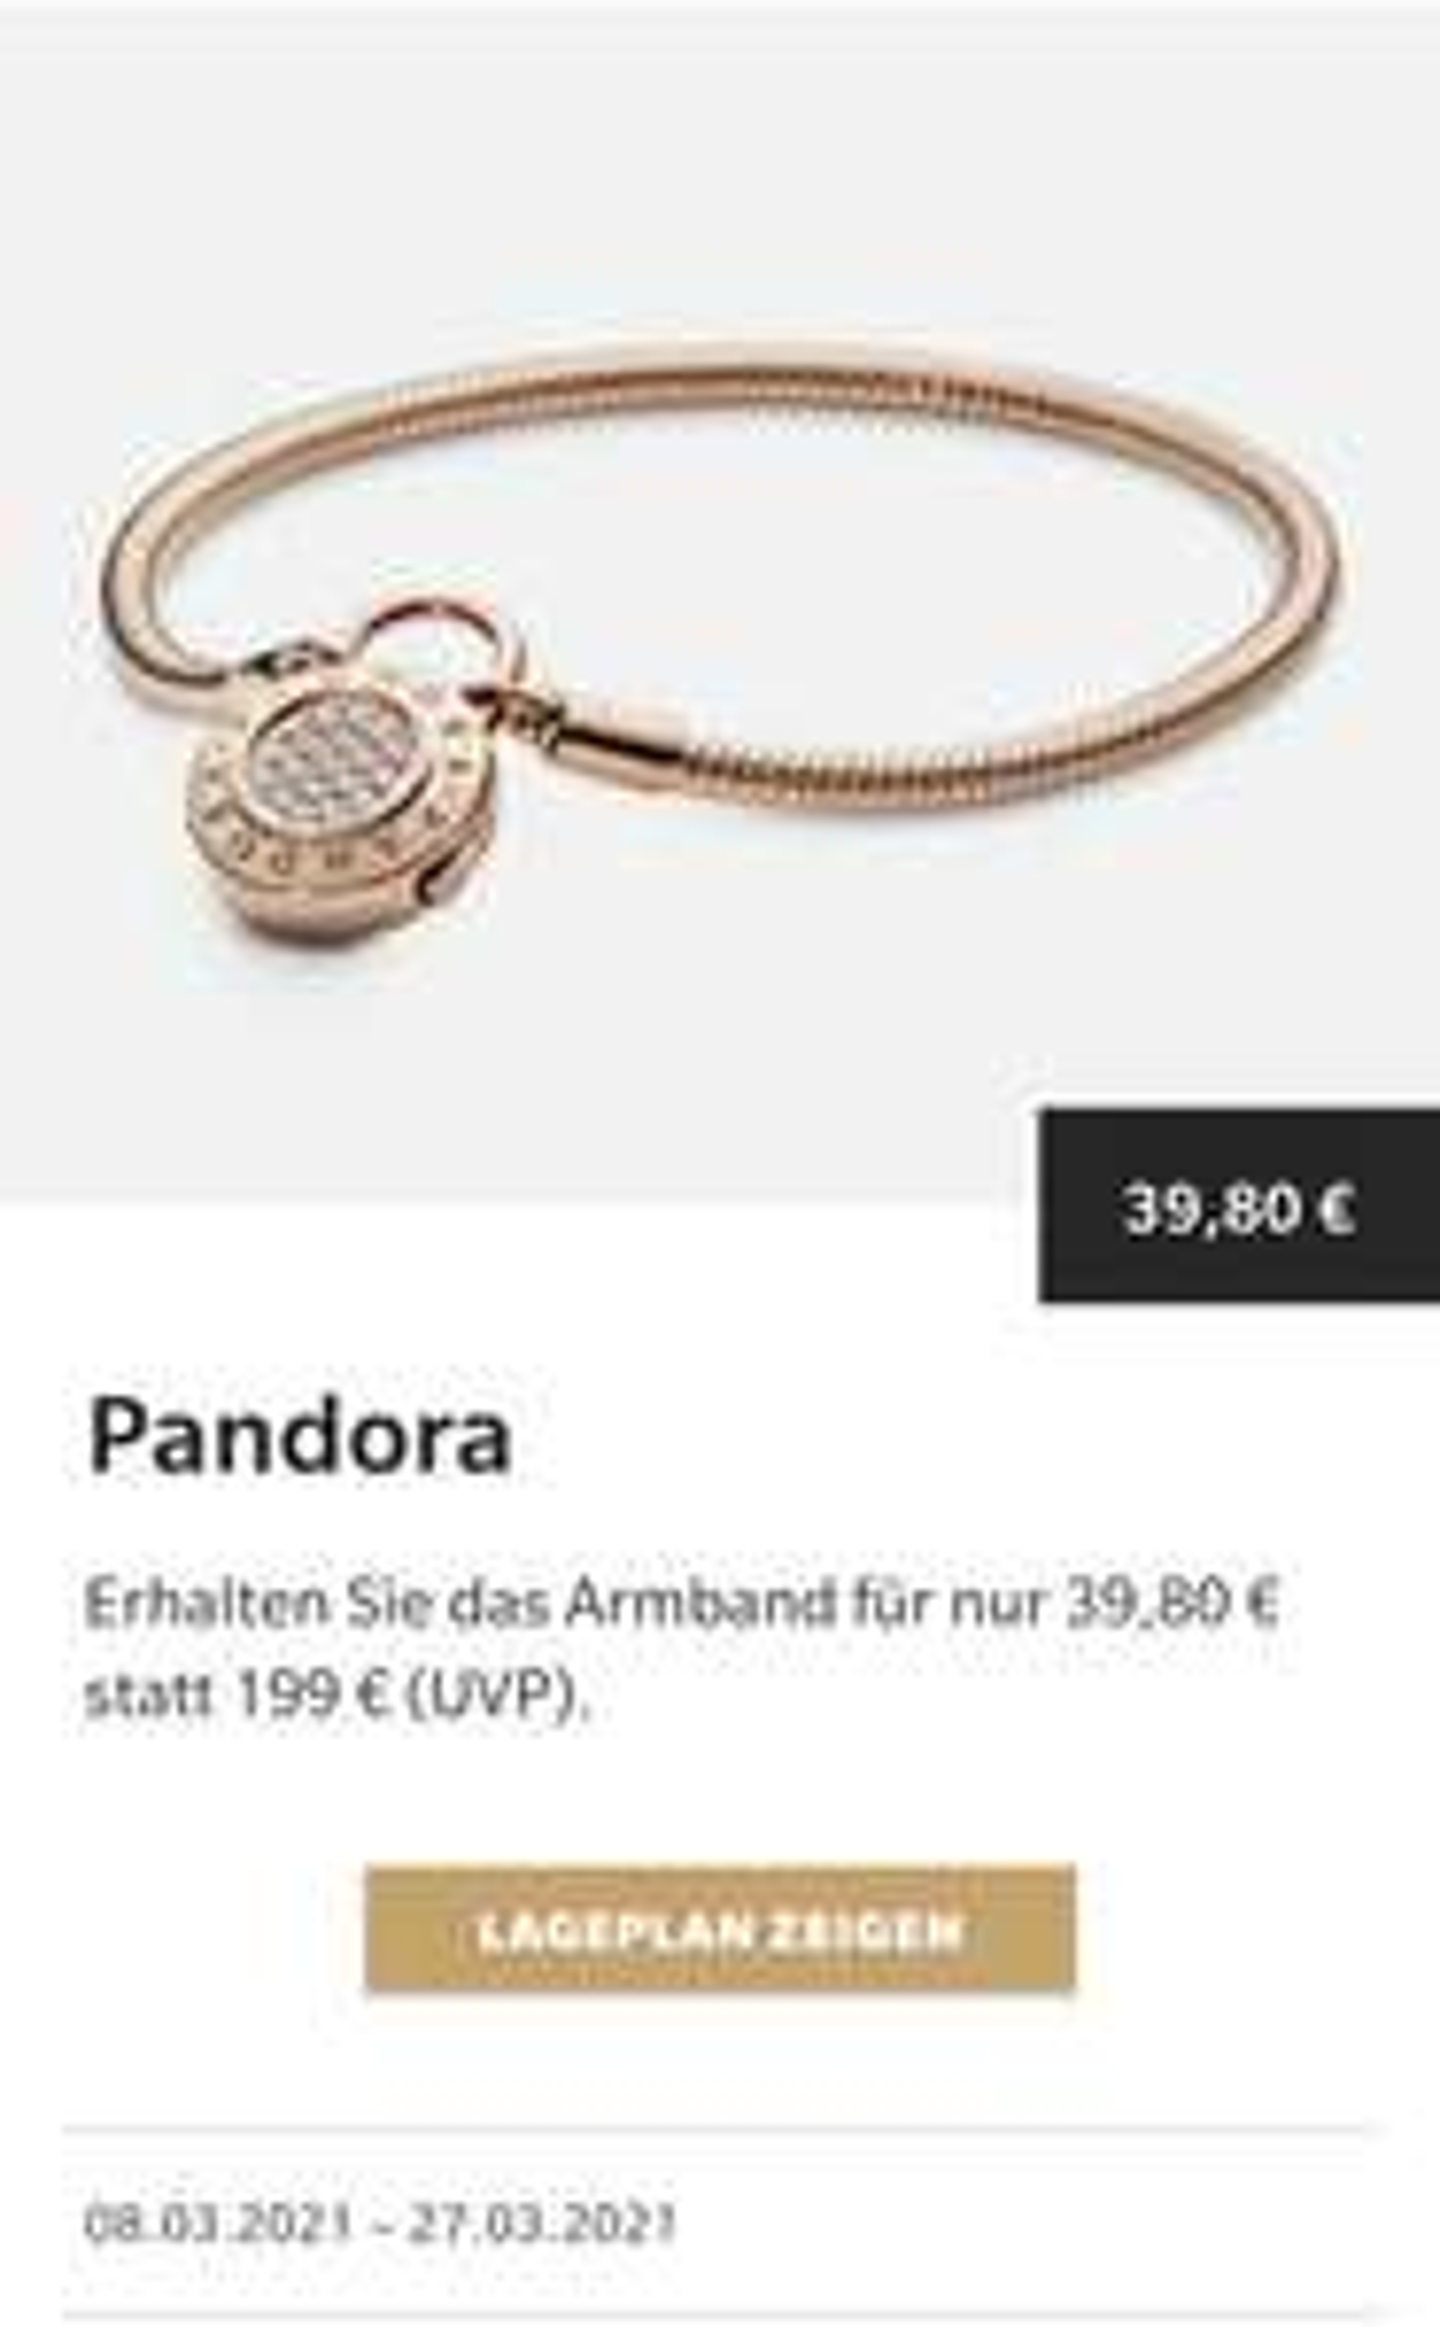 Pandora Armband - Lokal Metzingen ( Outletcity)